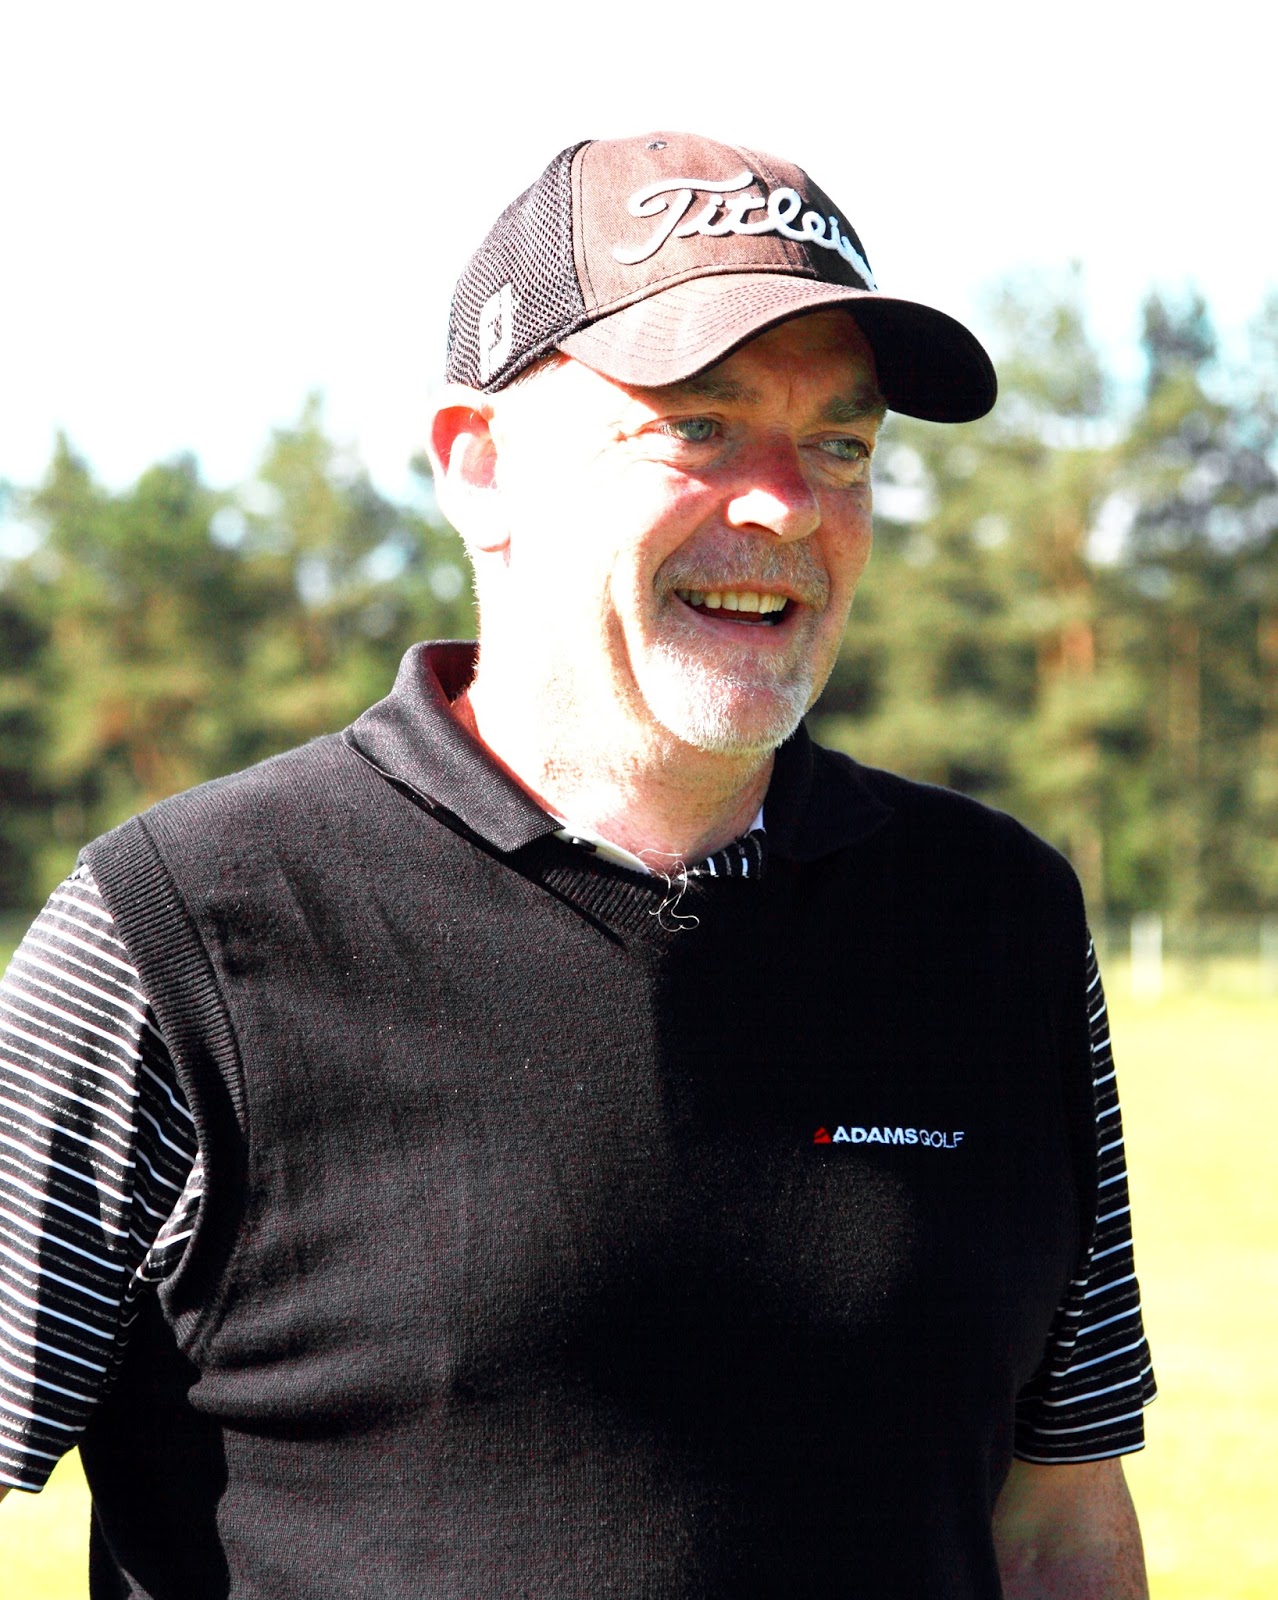 keith mcmanus scottish golf view golf news from around the world ...